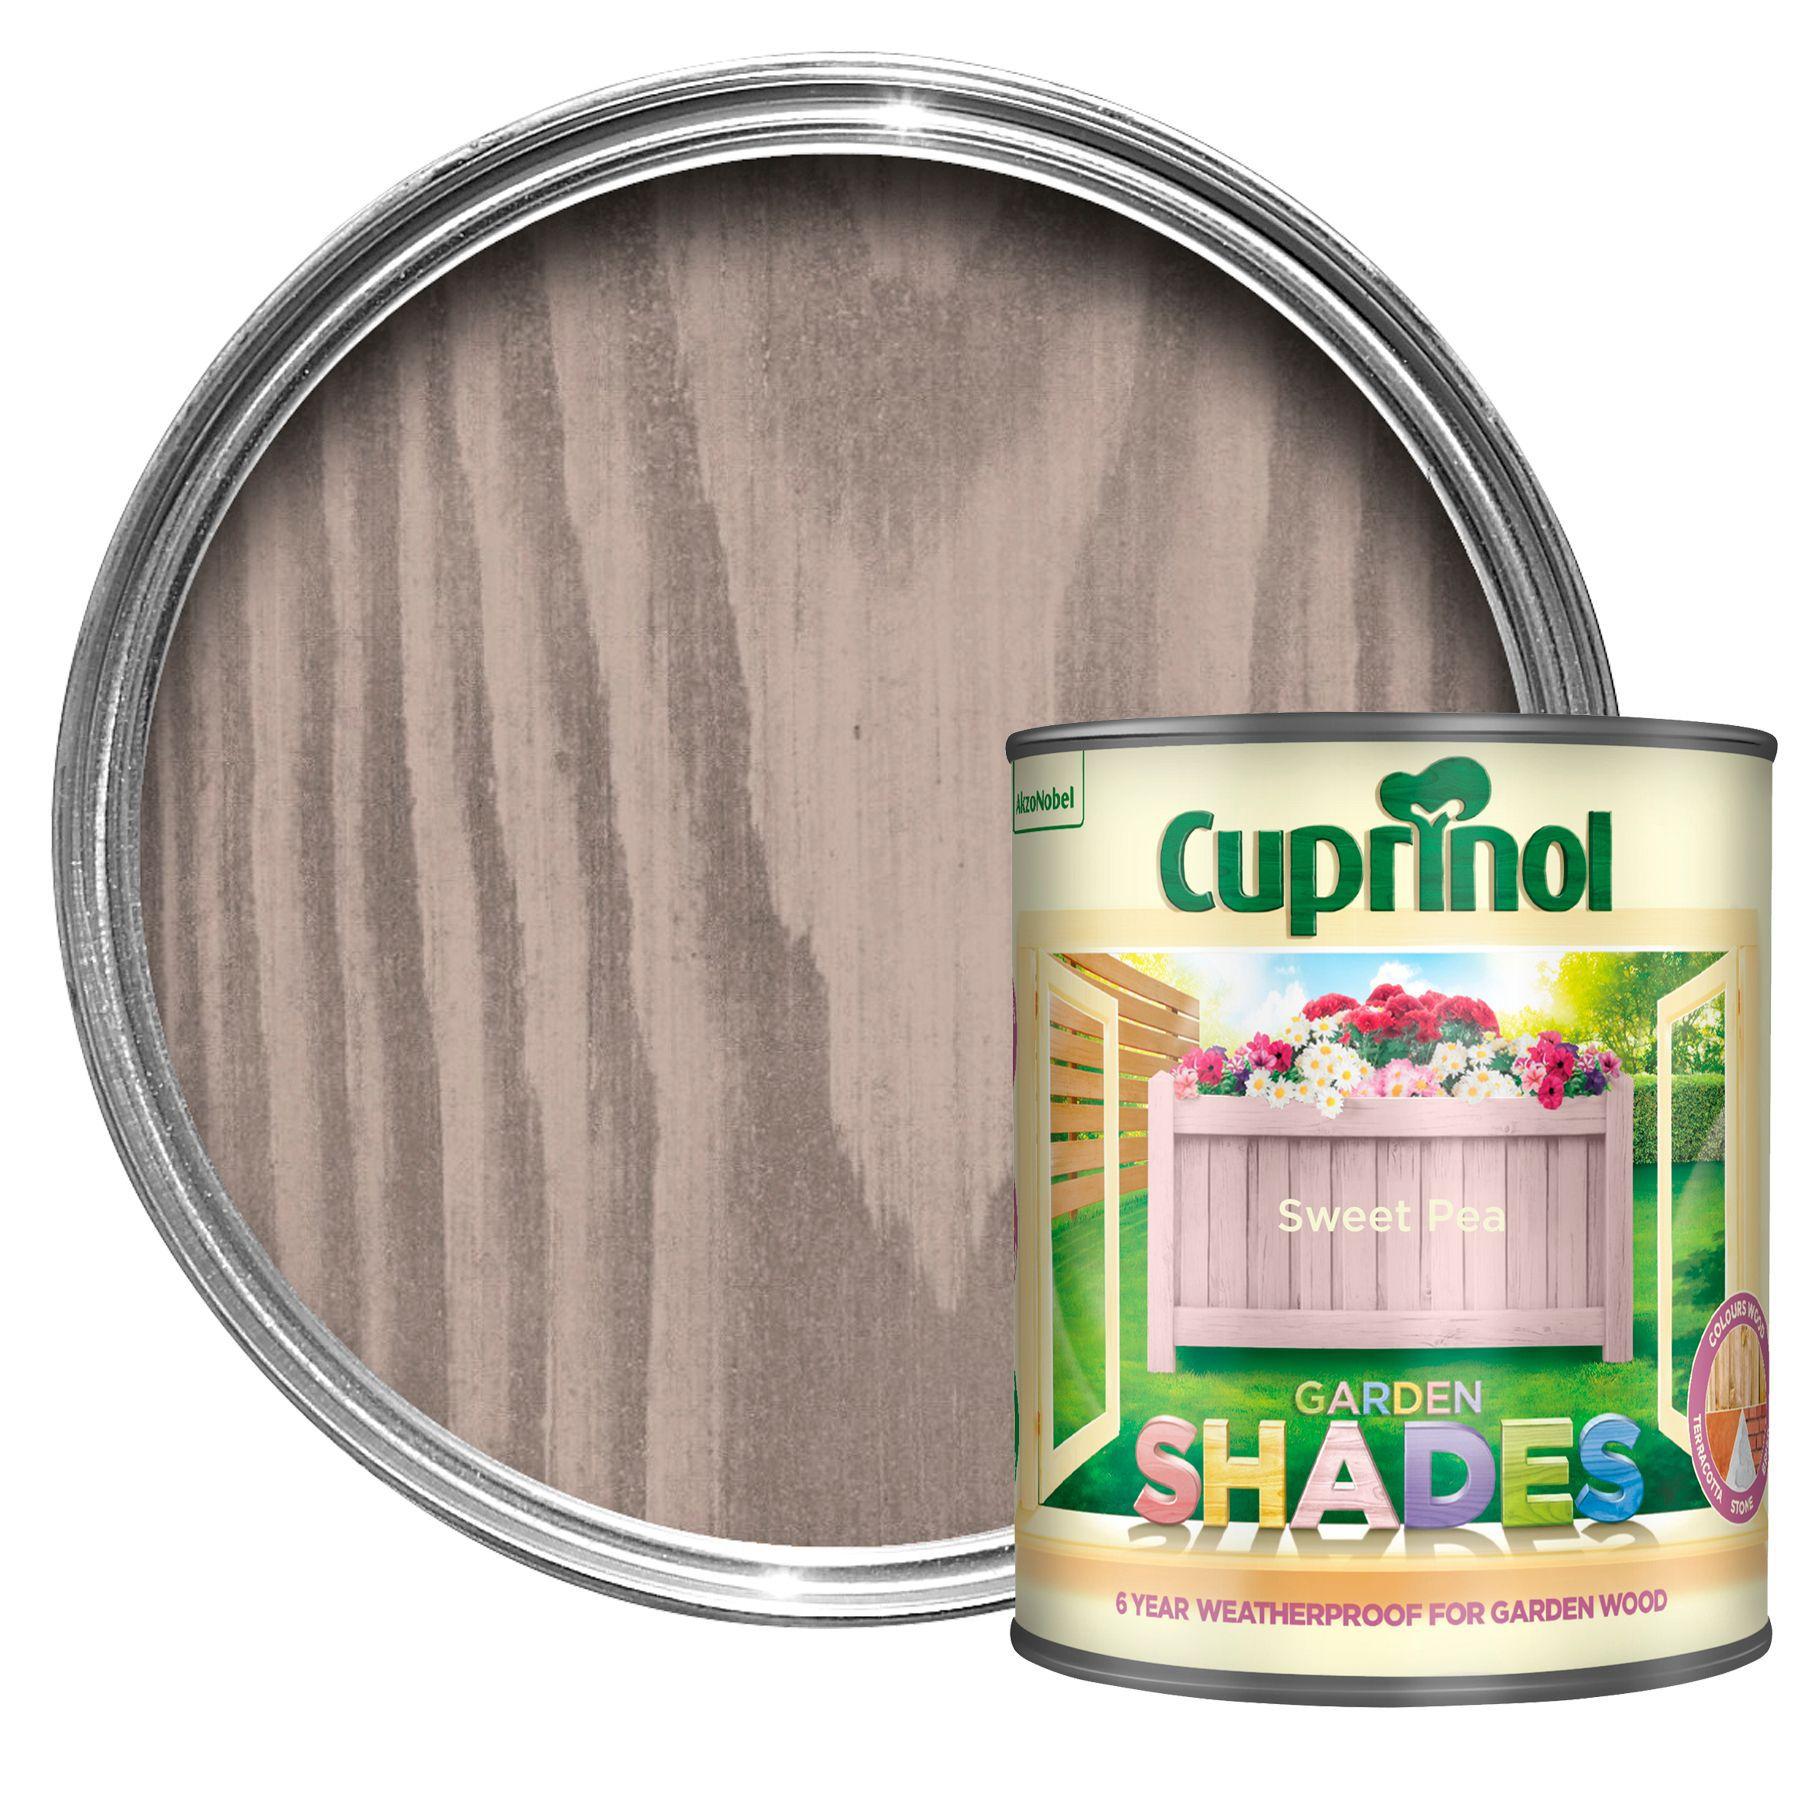 Cuprinol Garden Shades Sweet Pea Matt Wood Paint 1l